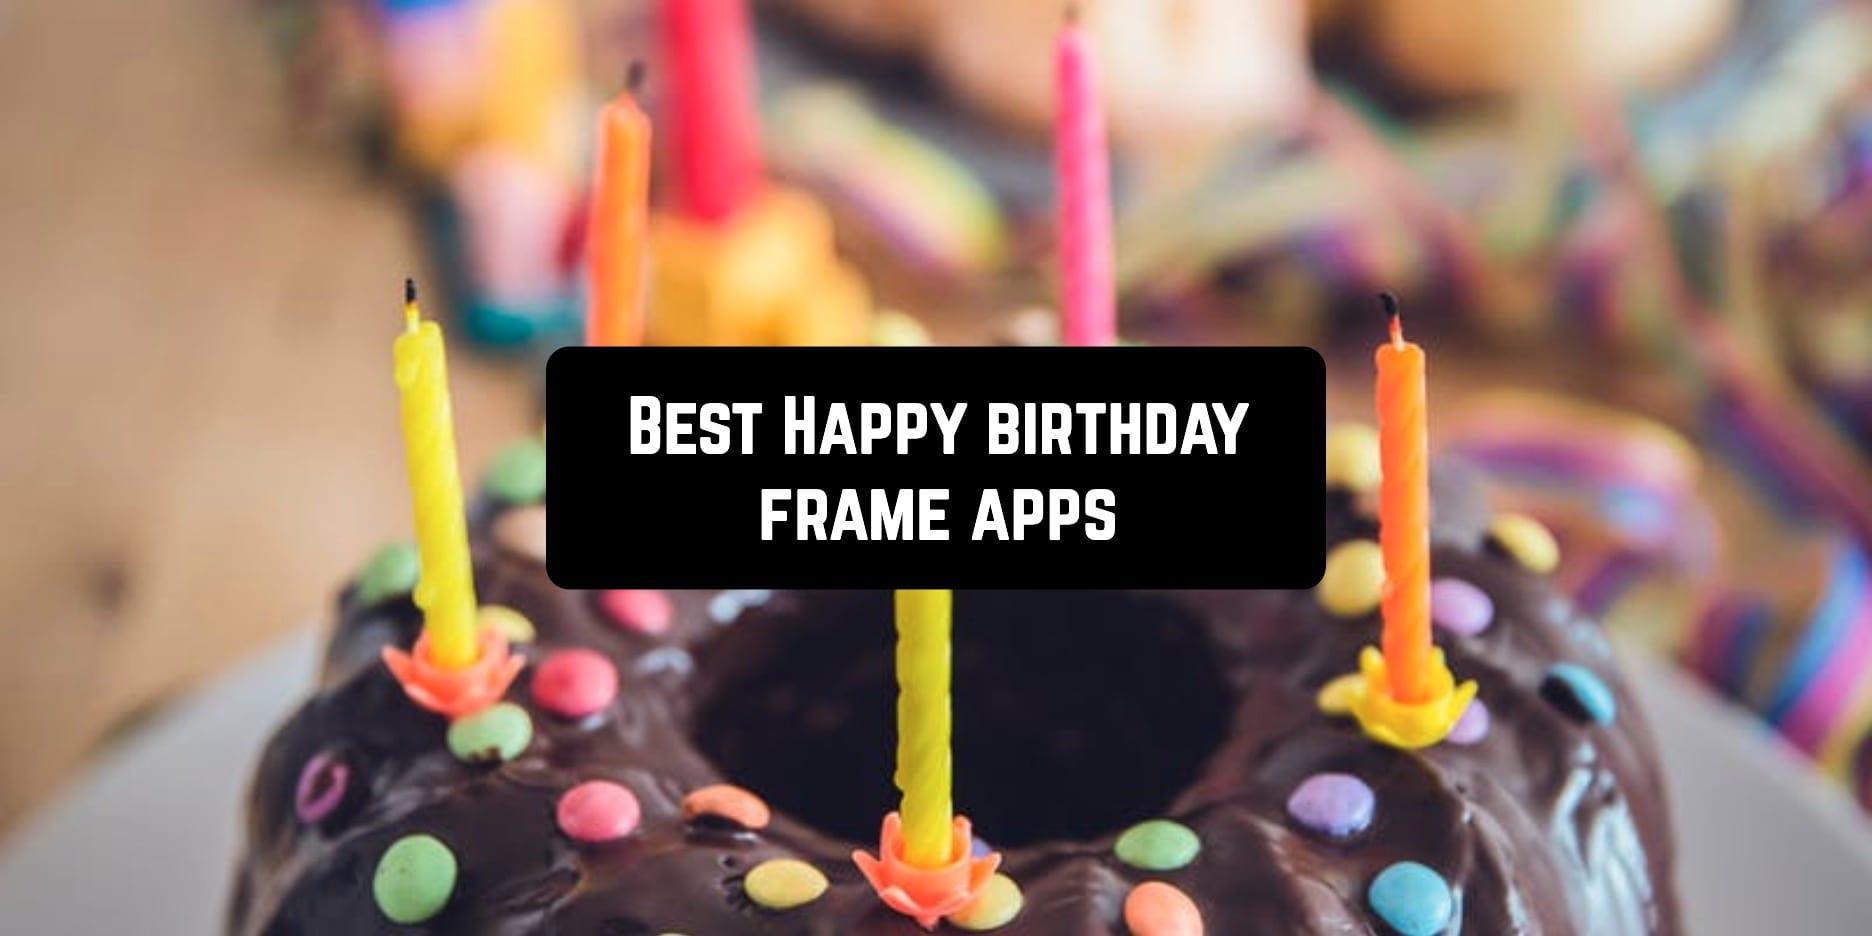 Best Happy birthday frame apps